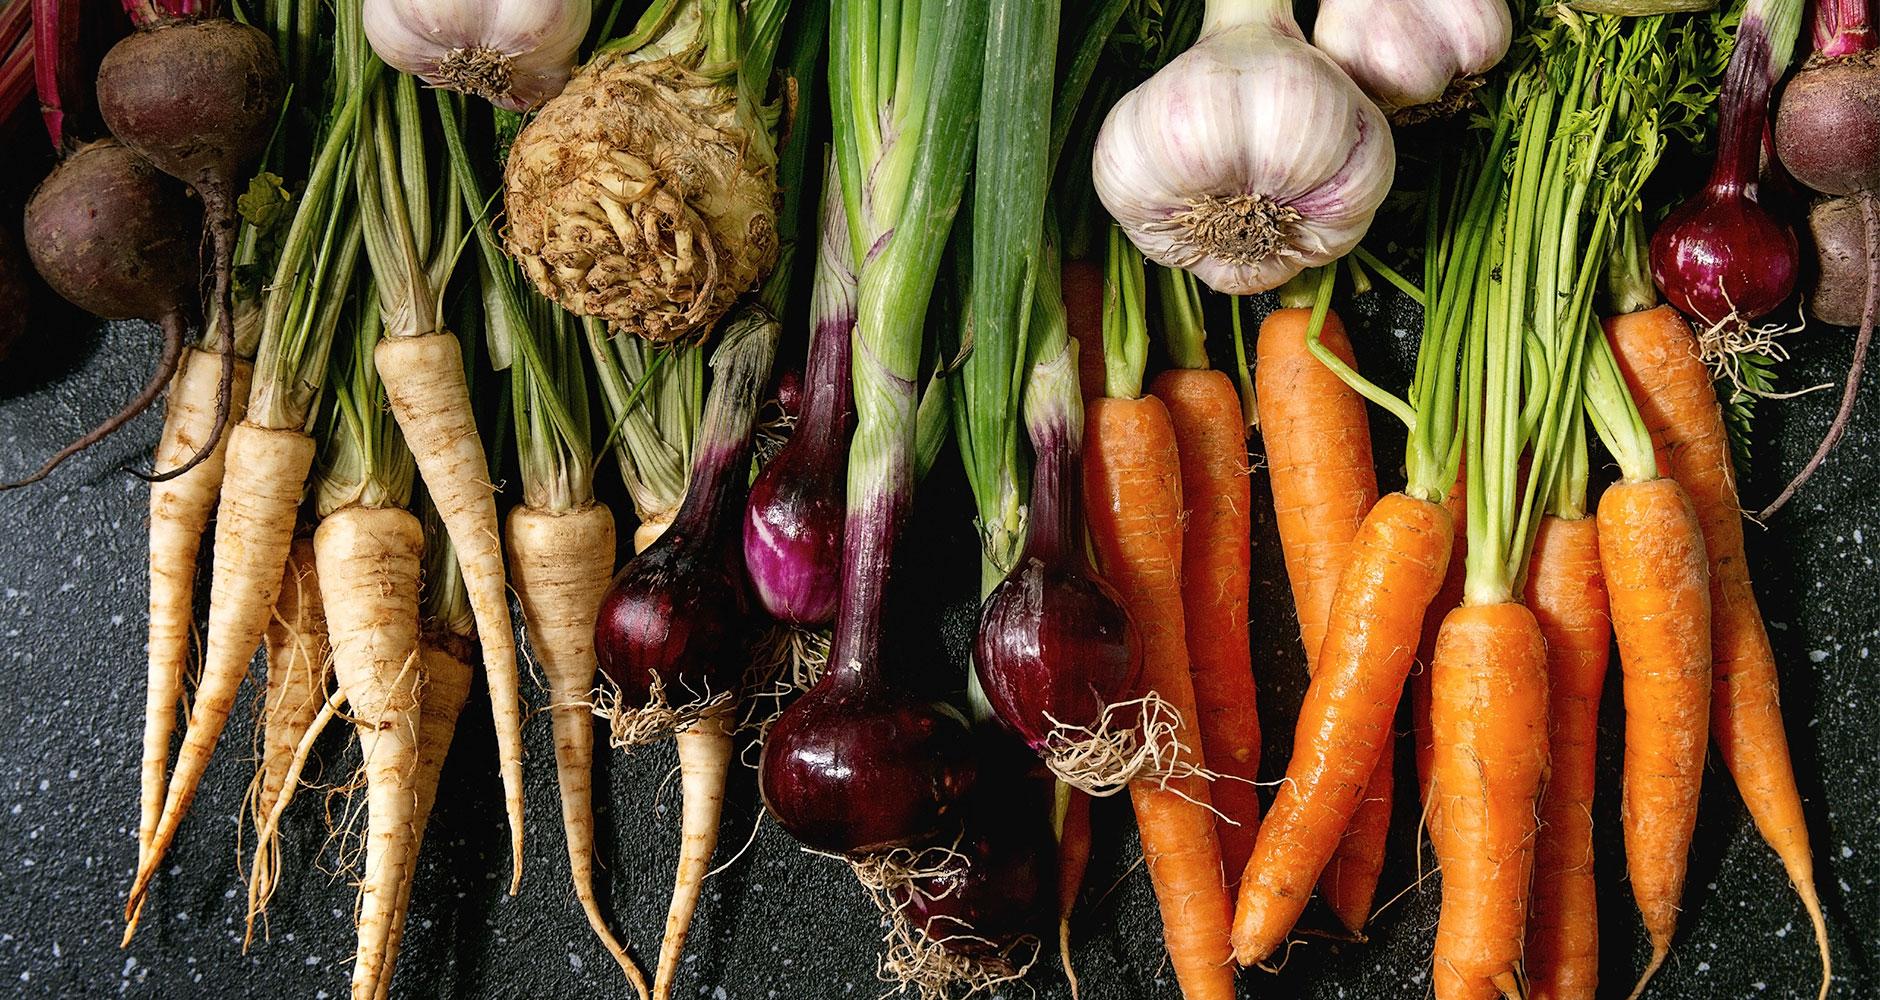 Storing Produce